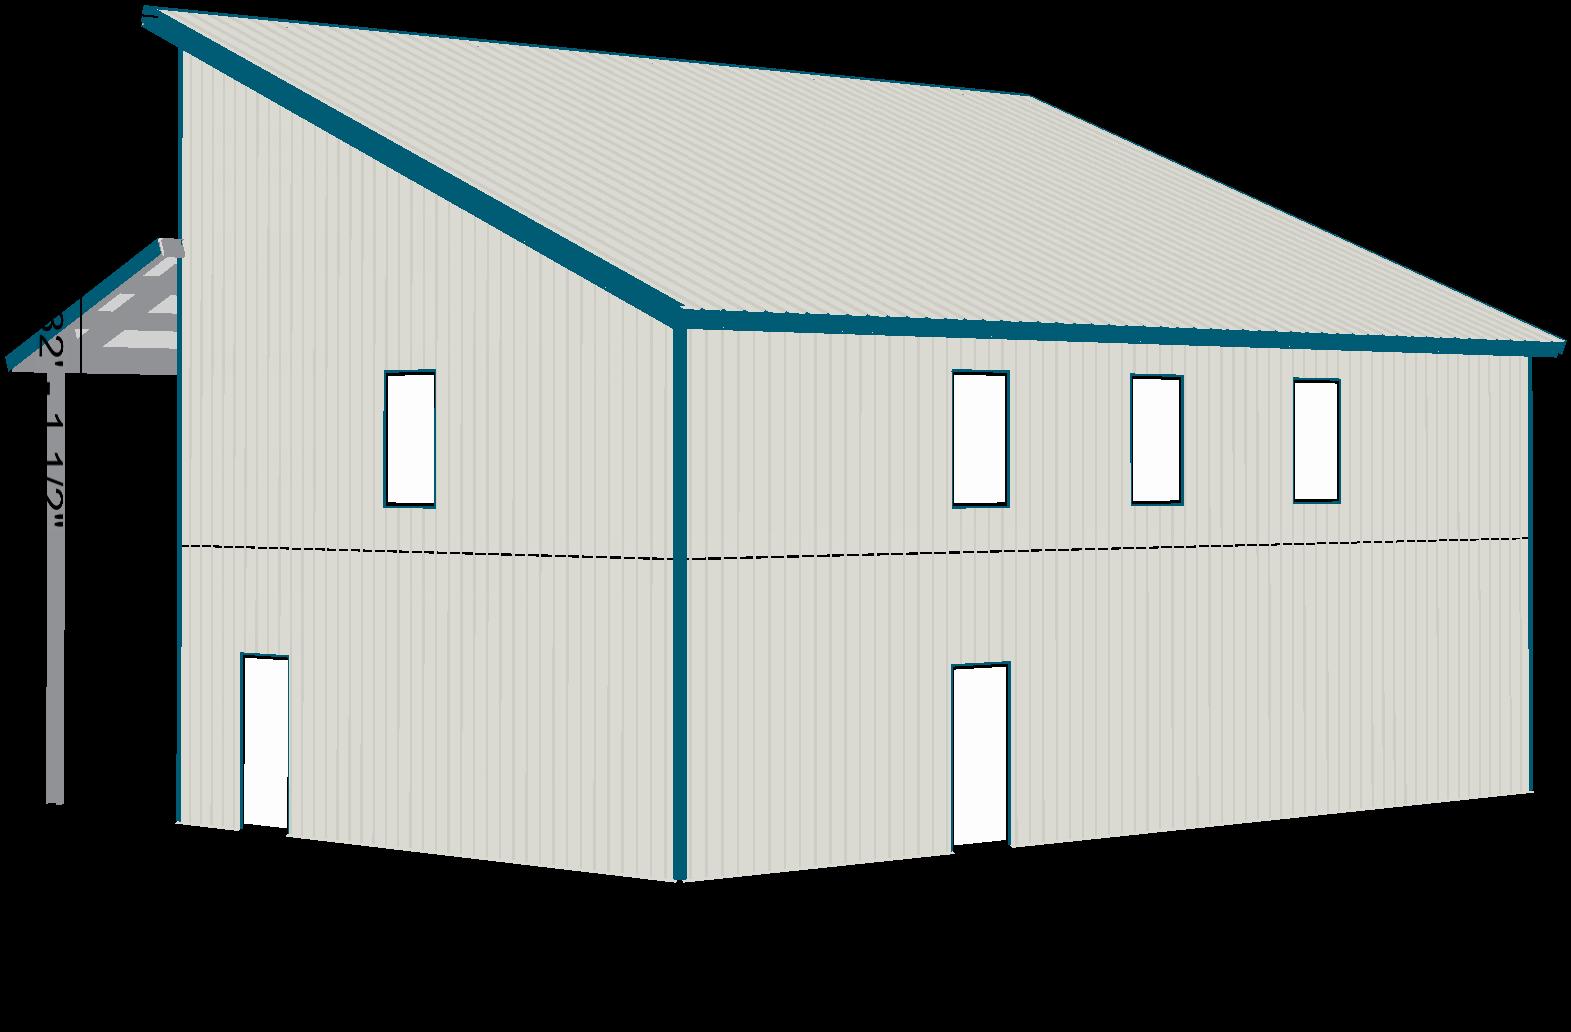 Steel Home Contemporary Shell Kit 2 Floors Single Slope Roof Ebay Steel House 2nd Floor Roof